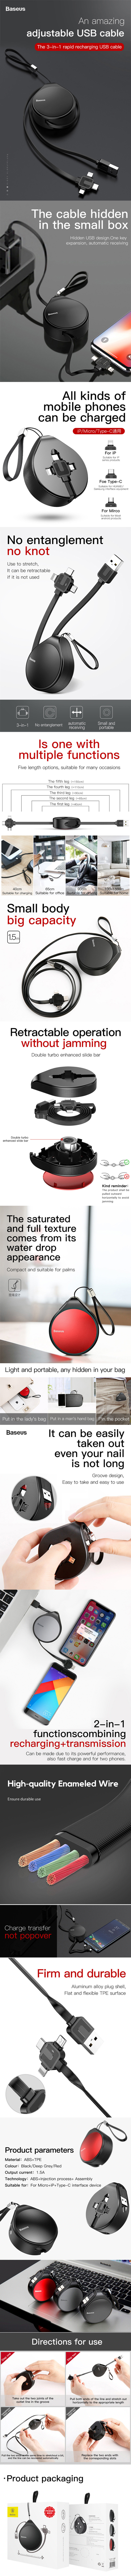 کابل سه کاره بیسوس مدل Waterdrop 3-in-1 Scaling